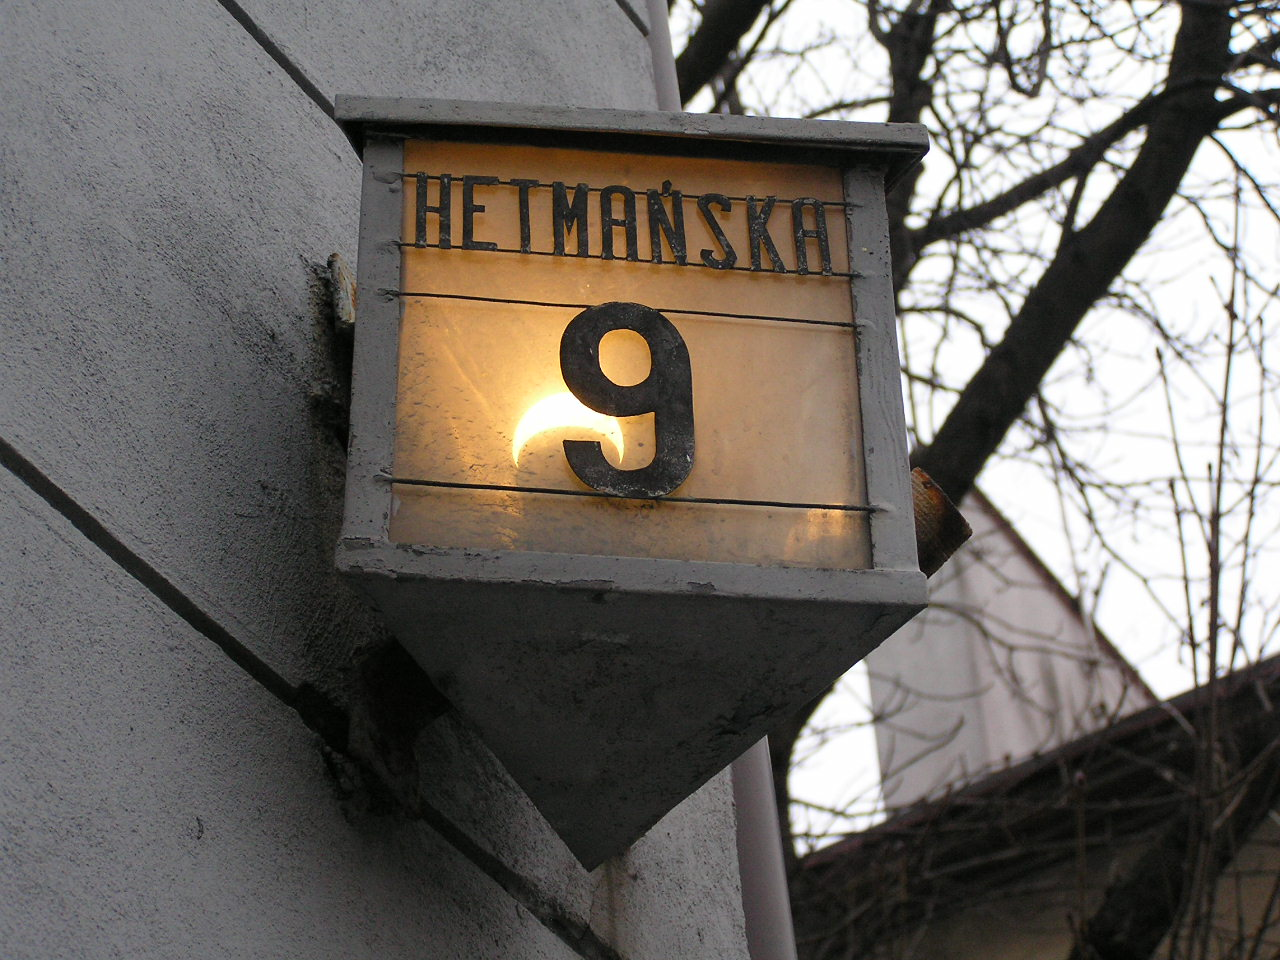 Latarenka adresowa - Hetmańska 9